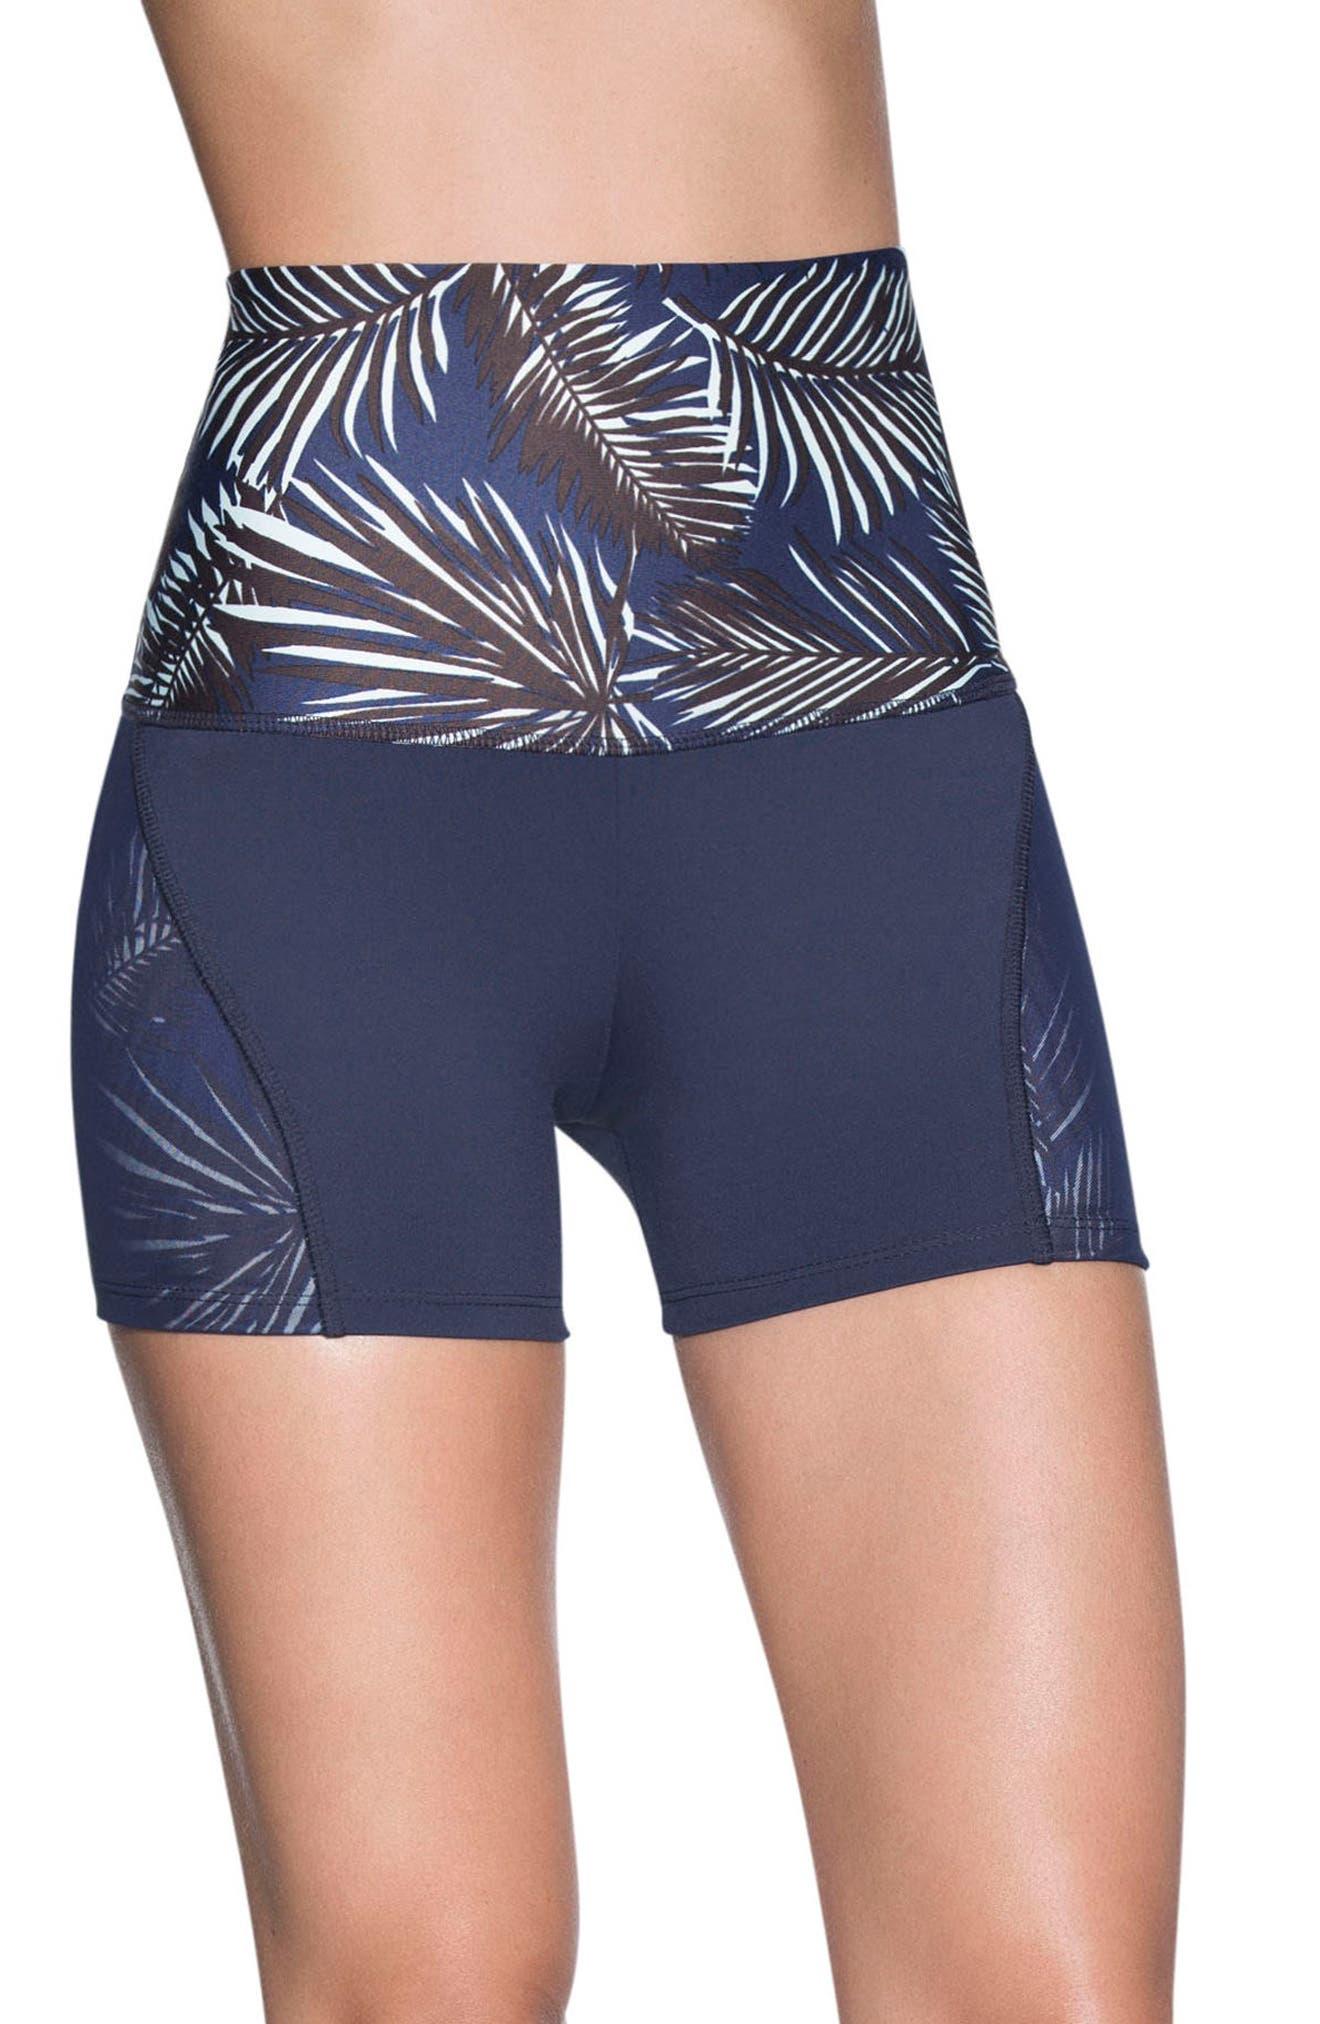 Cobra High Waist Shorts,                         Main,                         color, 431